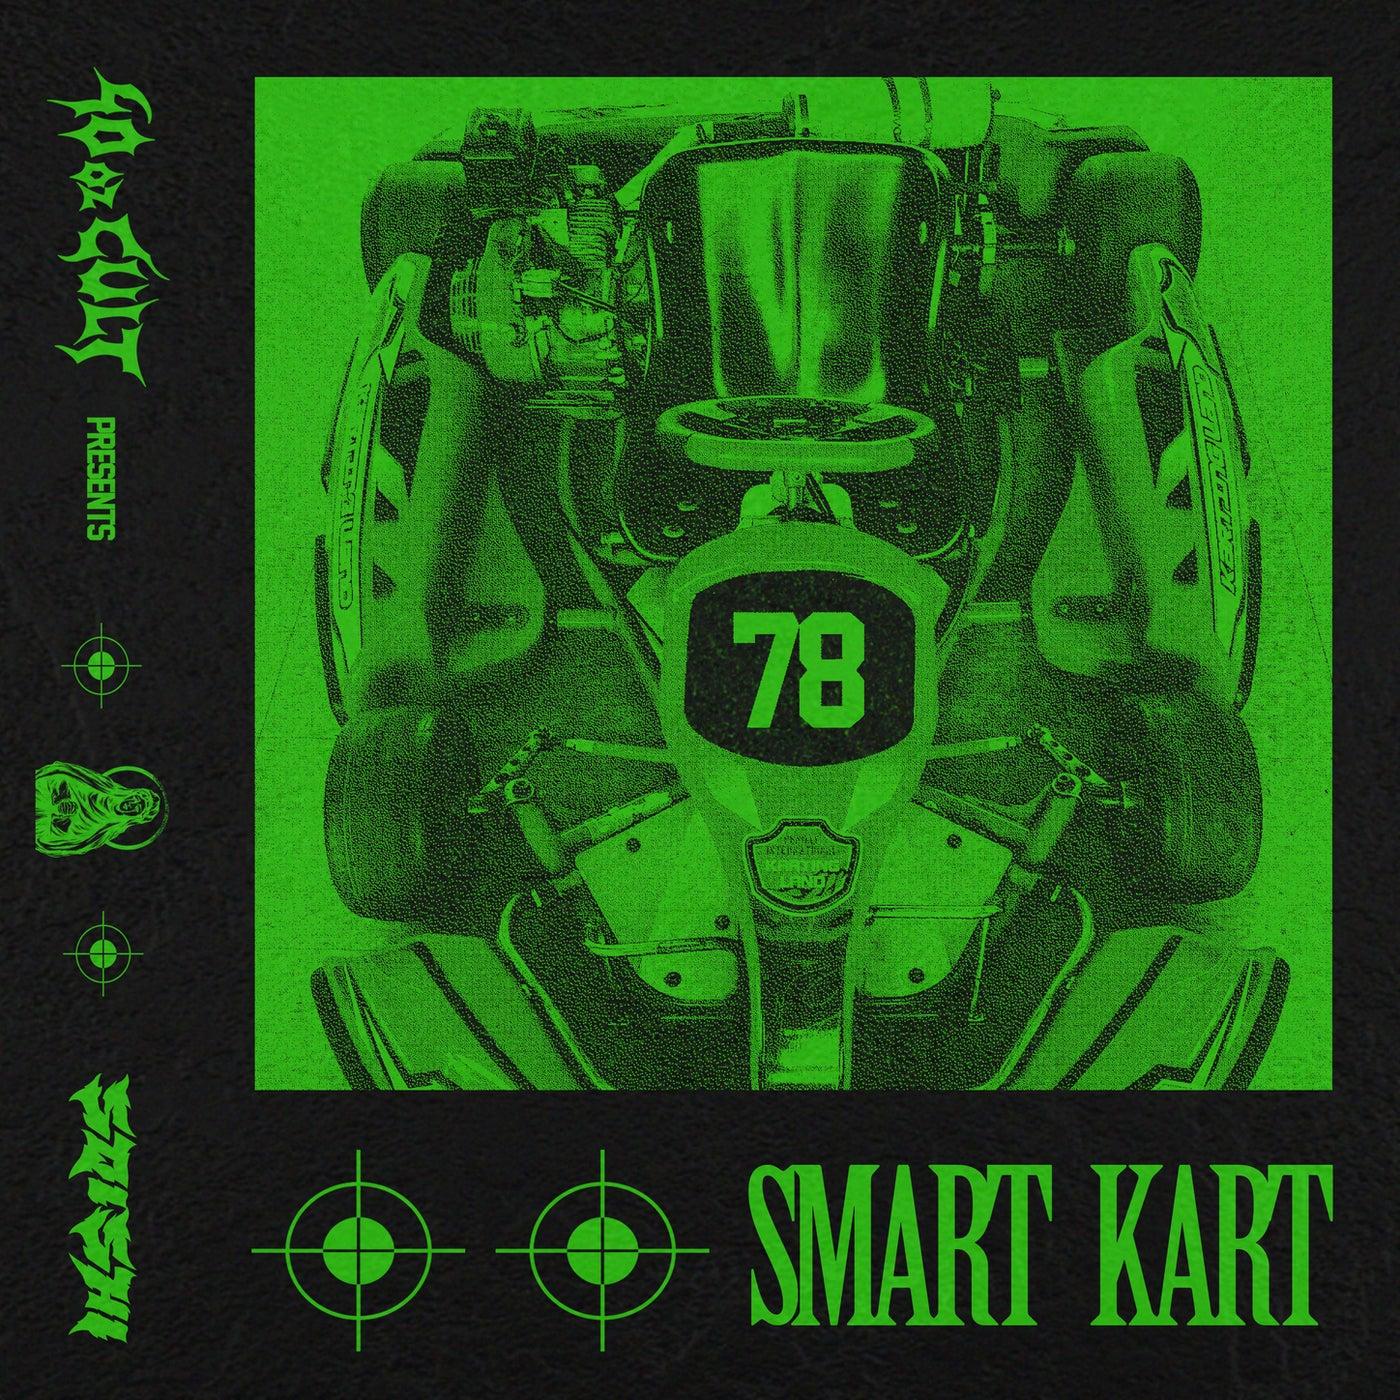 SMART KART (Original Mix)